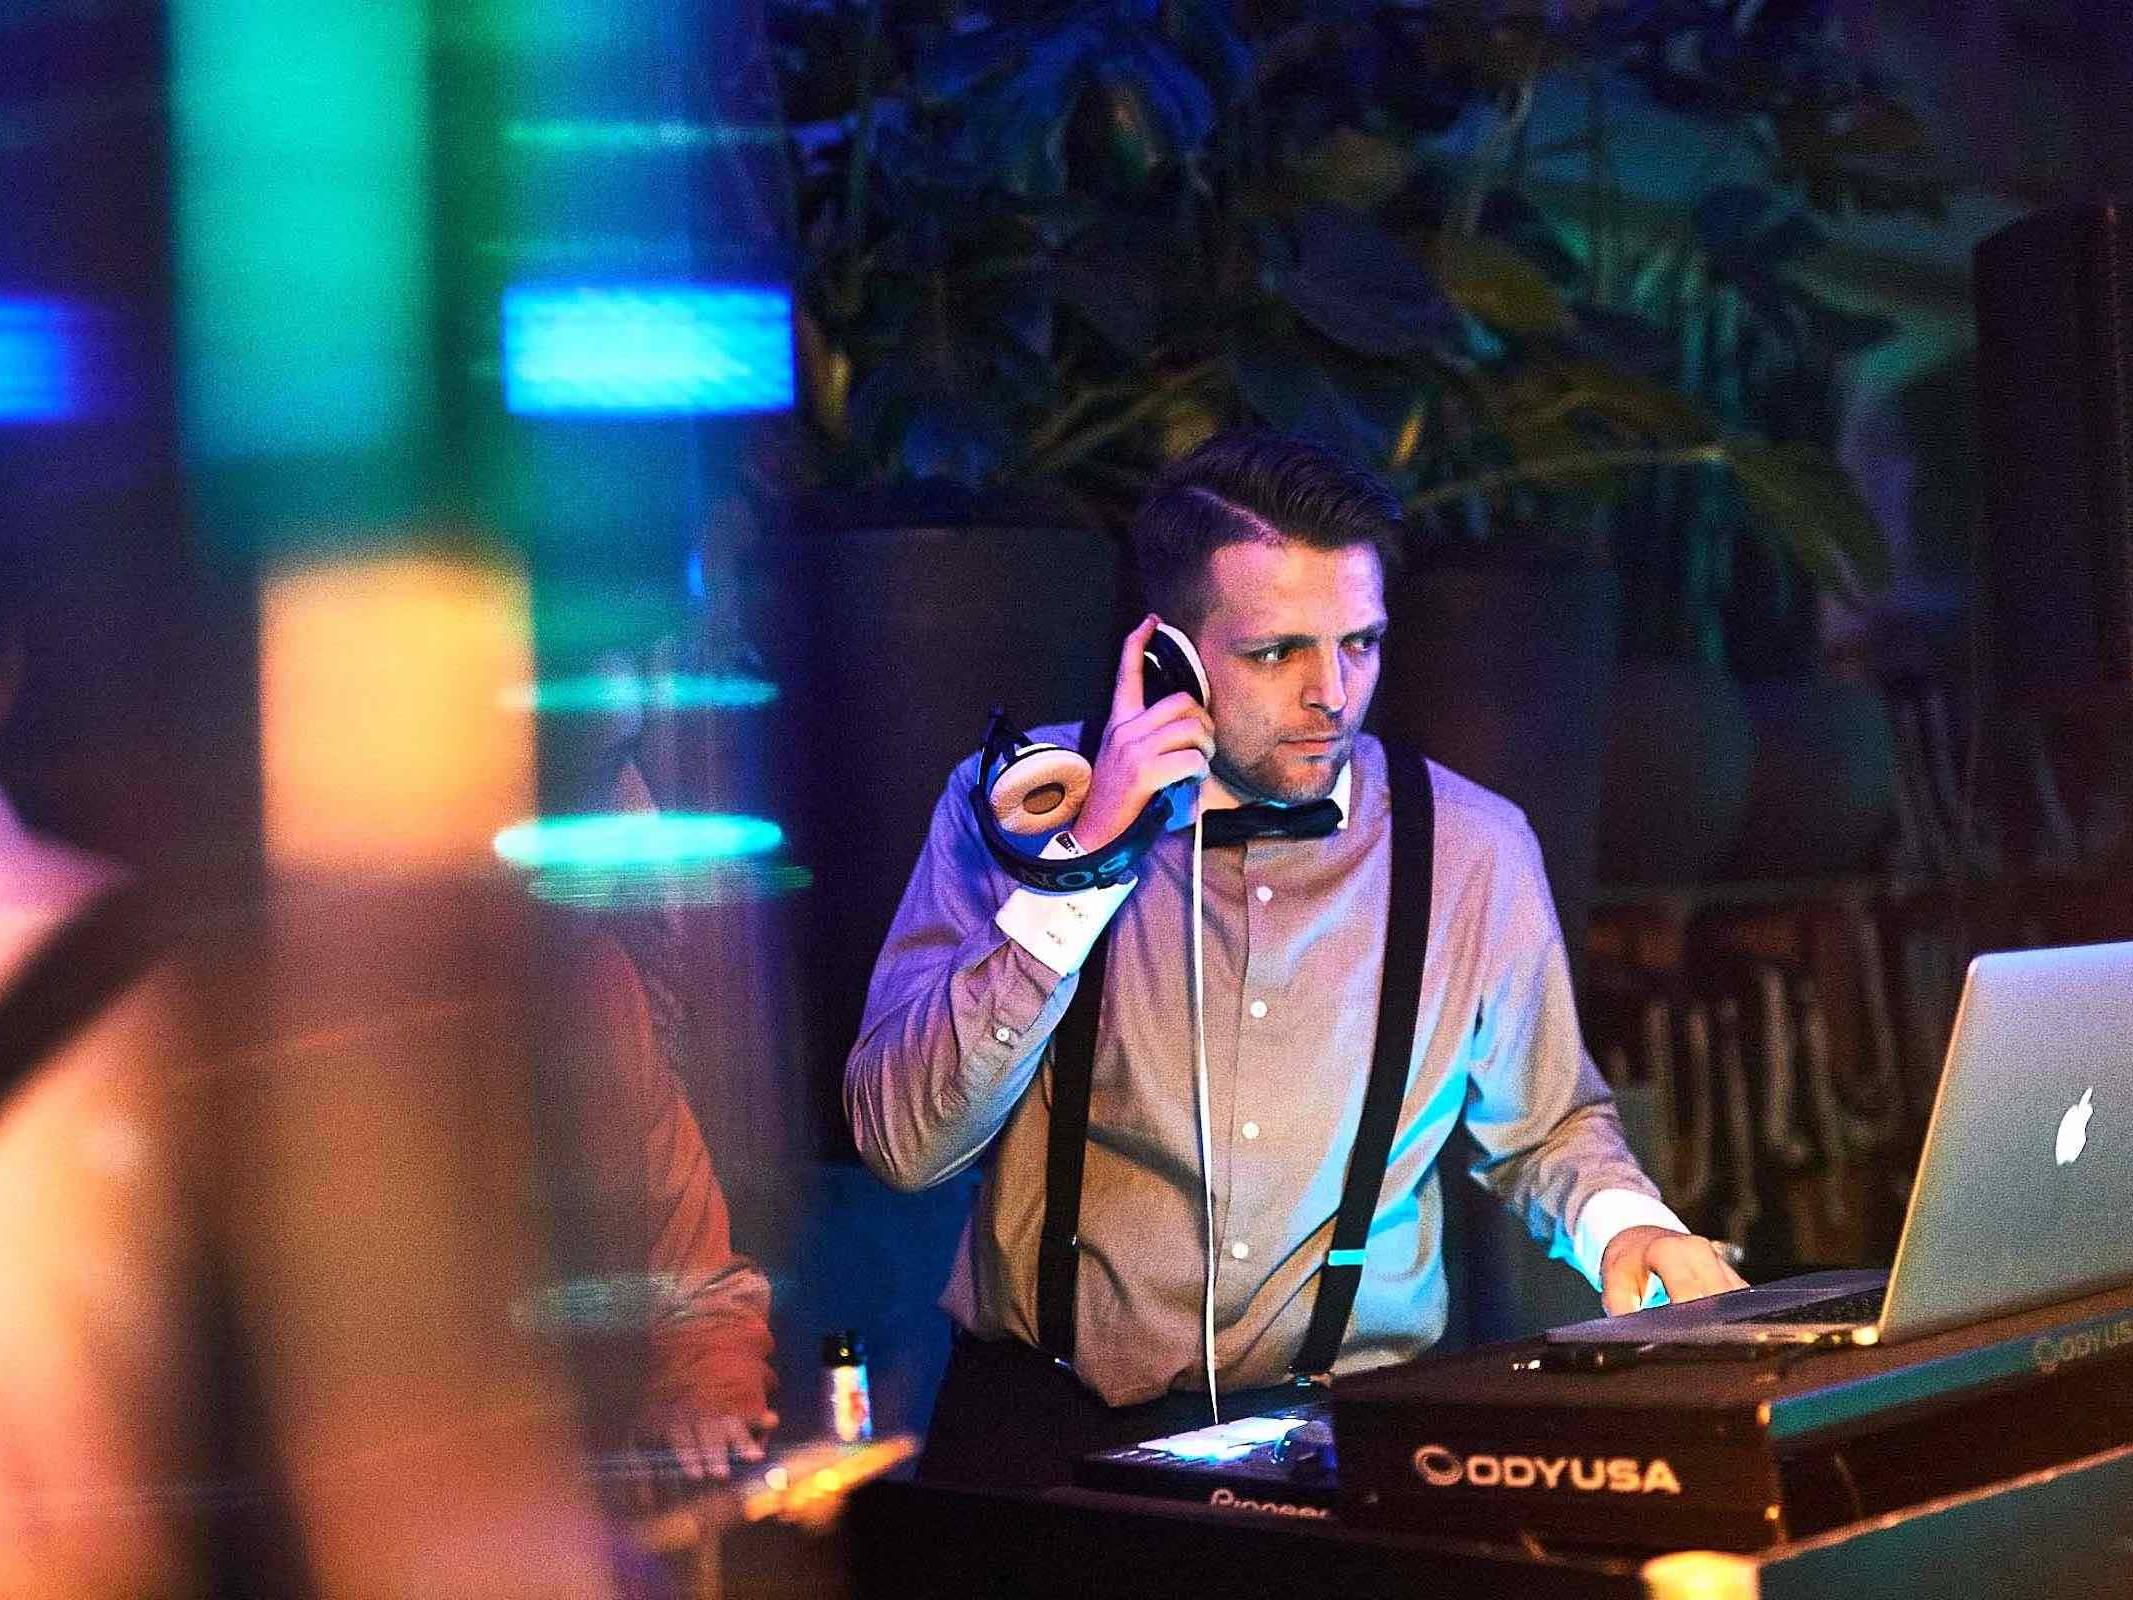 DJ | Hamburg | Buchen | Discjockey | Messe | DJ | Bremen | DJ | Event | DJ | Geburtstag | DJ | Mieten | Anfragen | DJ | Kosten | DJ | Agentur | DJ | Timm | Hamburgfeiert